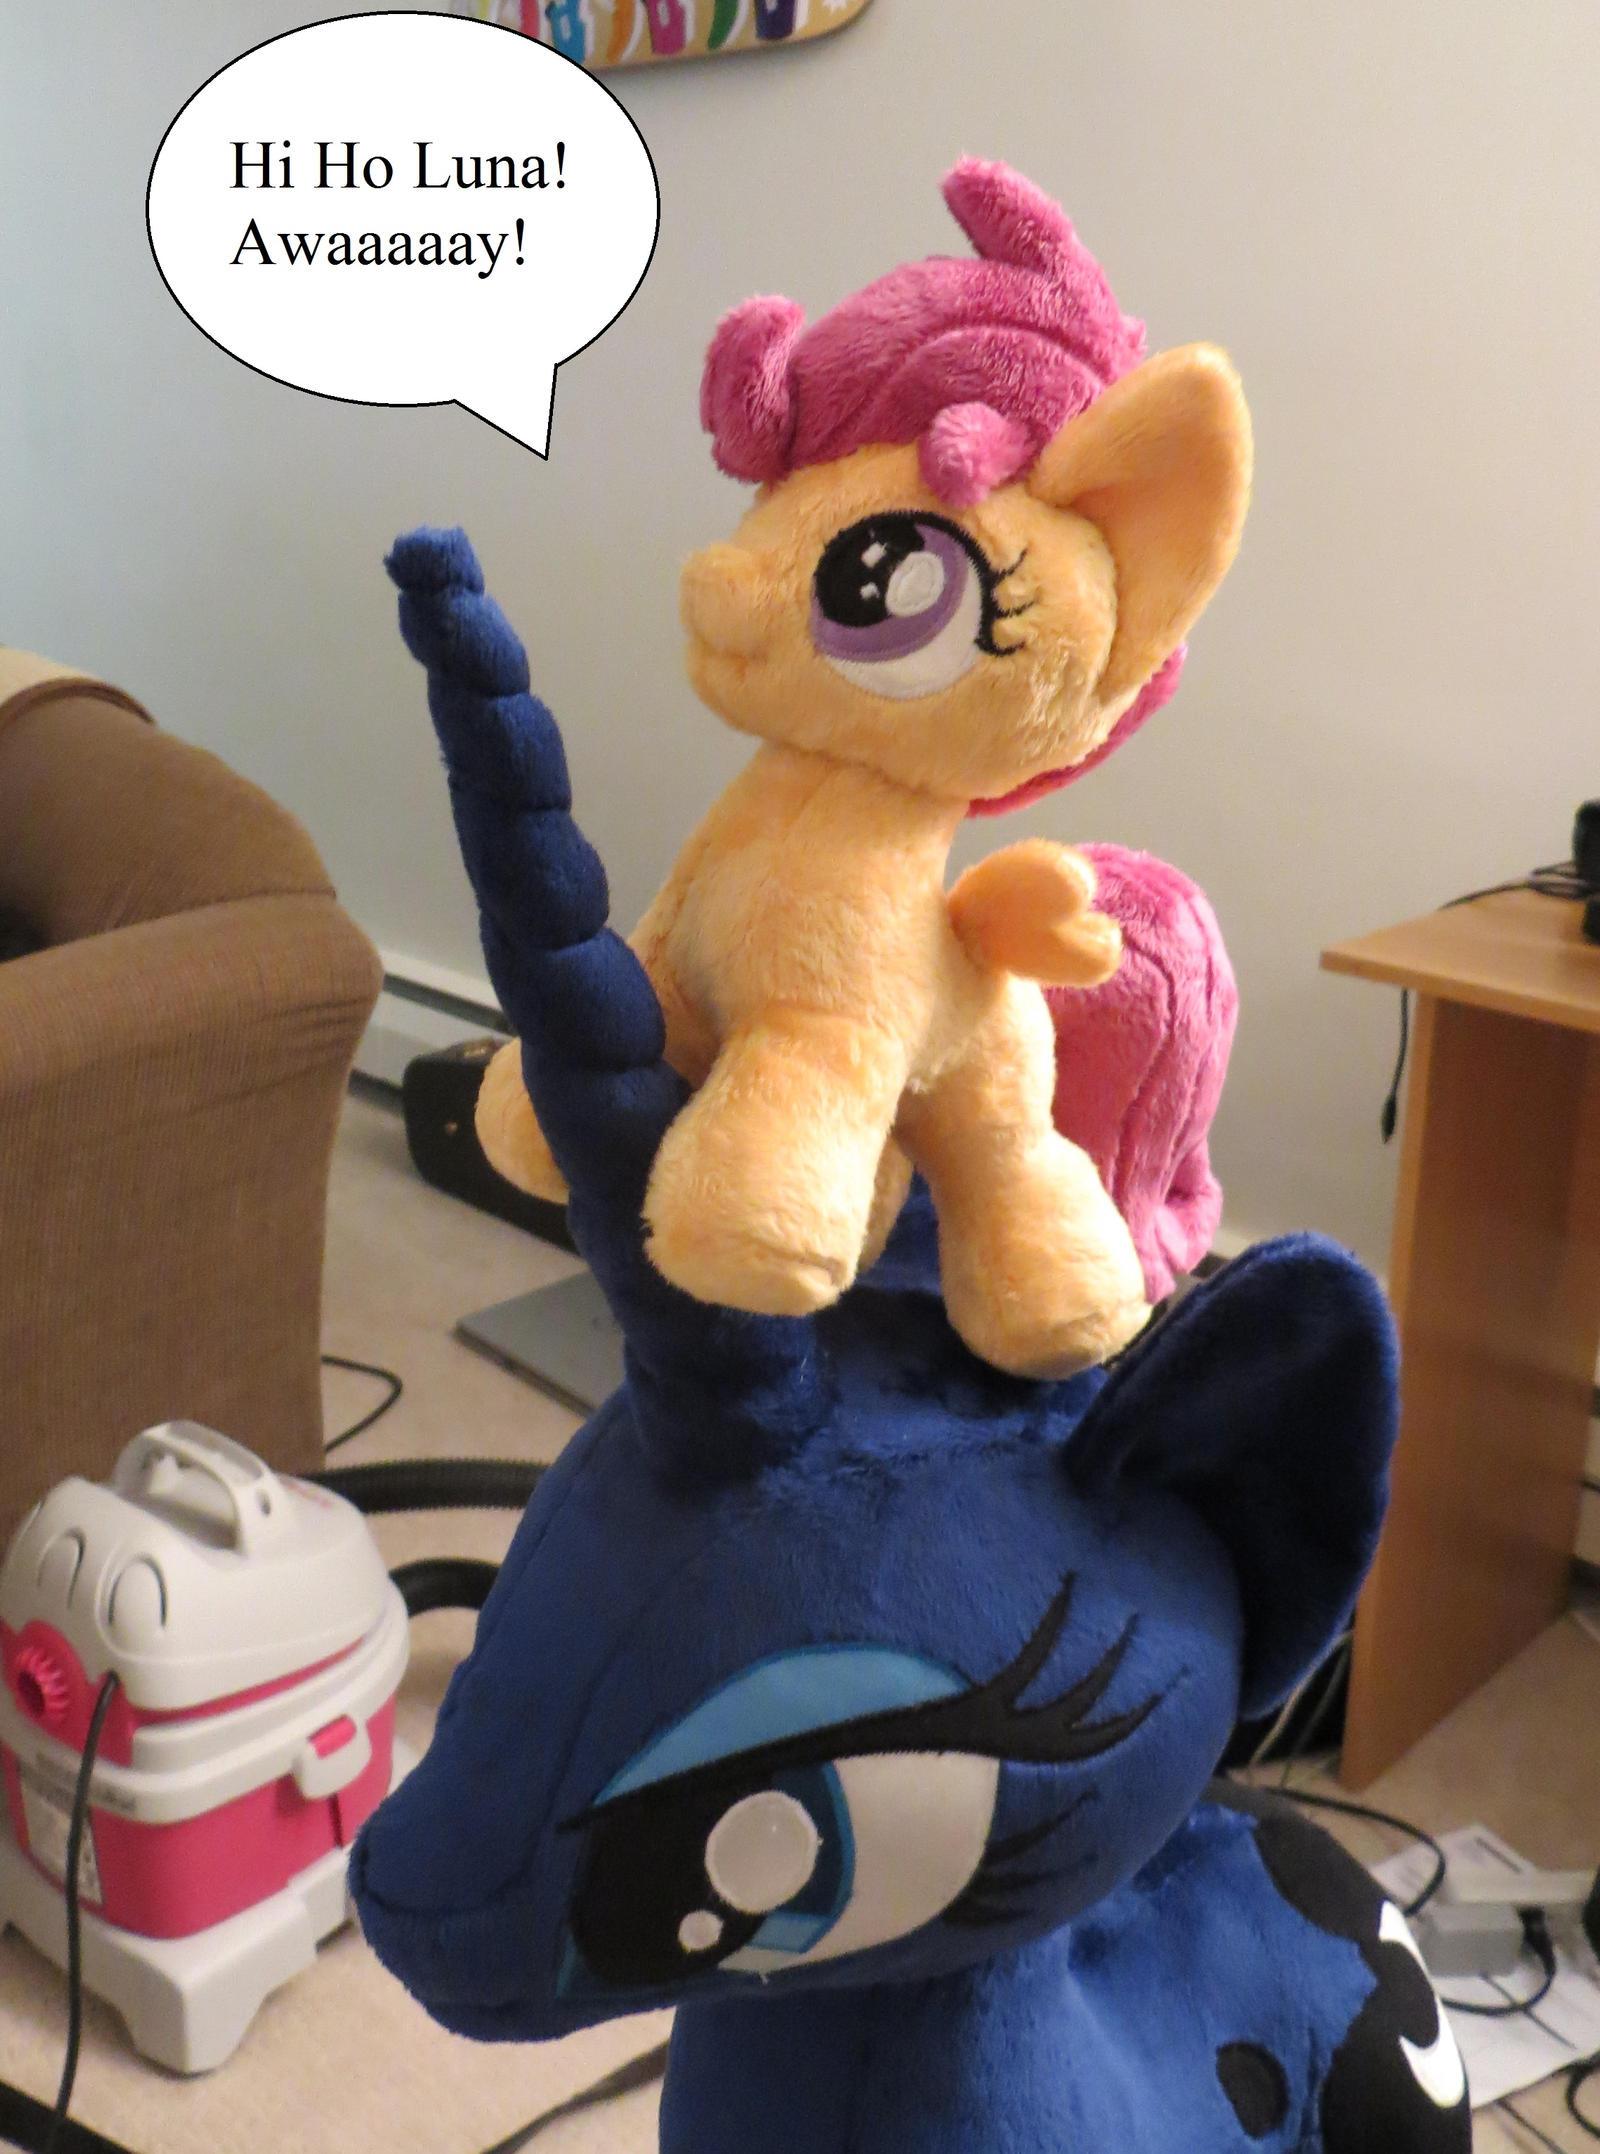 Go, Mecha Luna! by fireflytwinkletoes